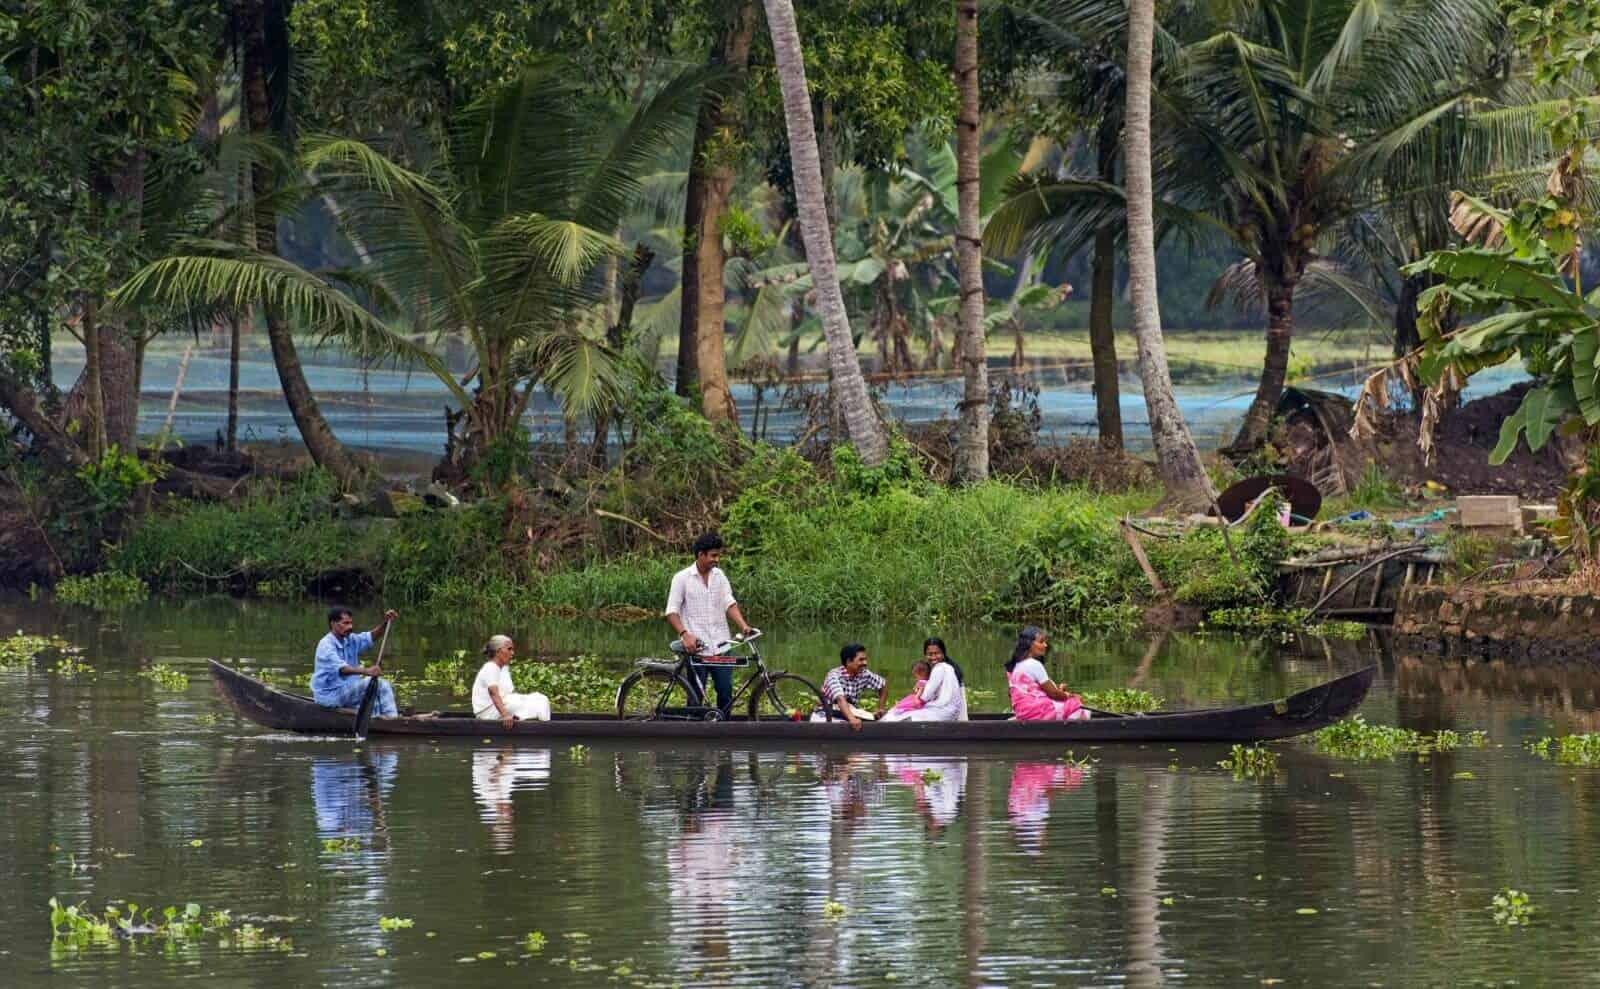 Hinterland Kerala